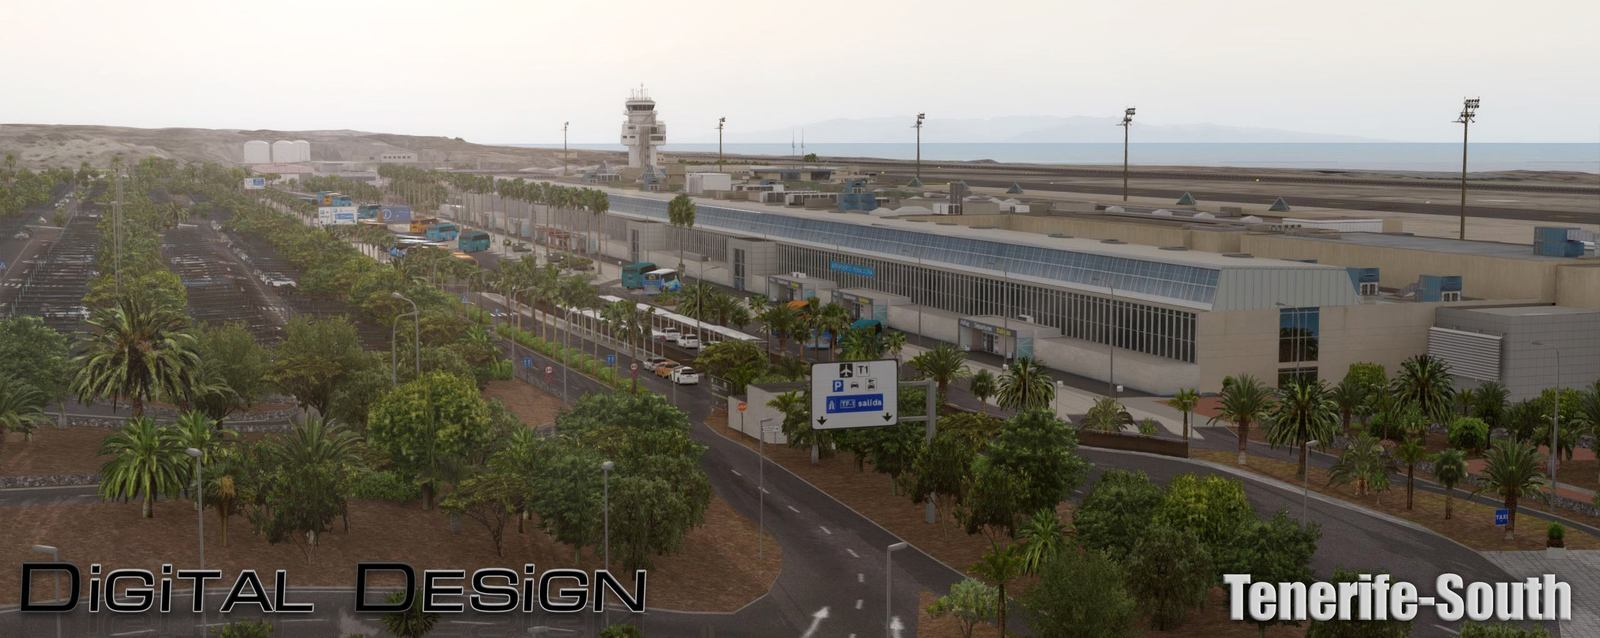 Aeroporto Tenerife Sud : Single preview of digital designs tenerife south gcts fselite